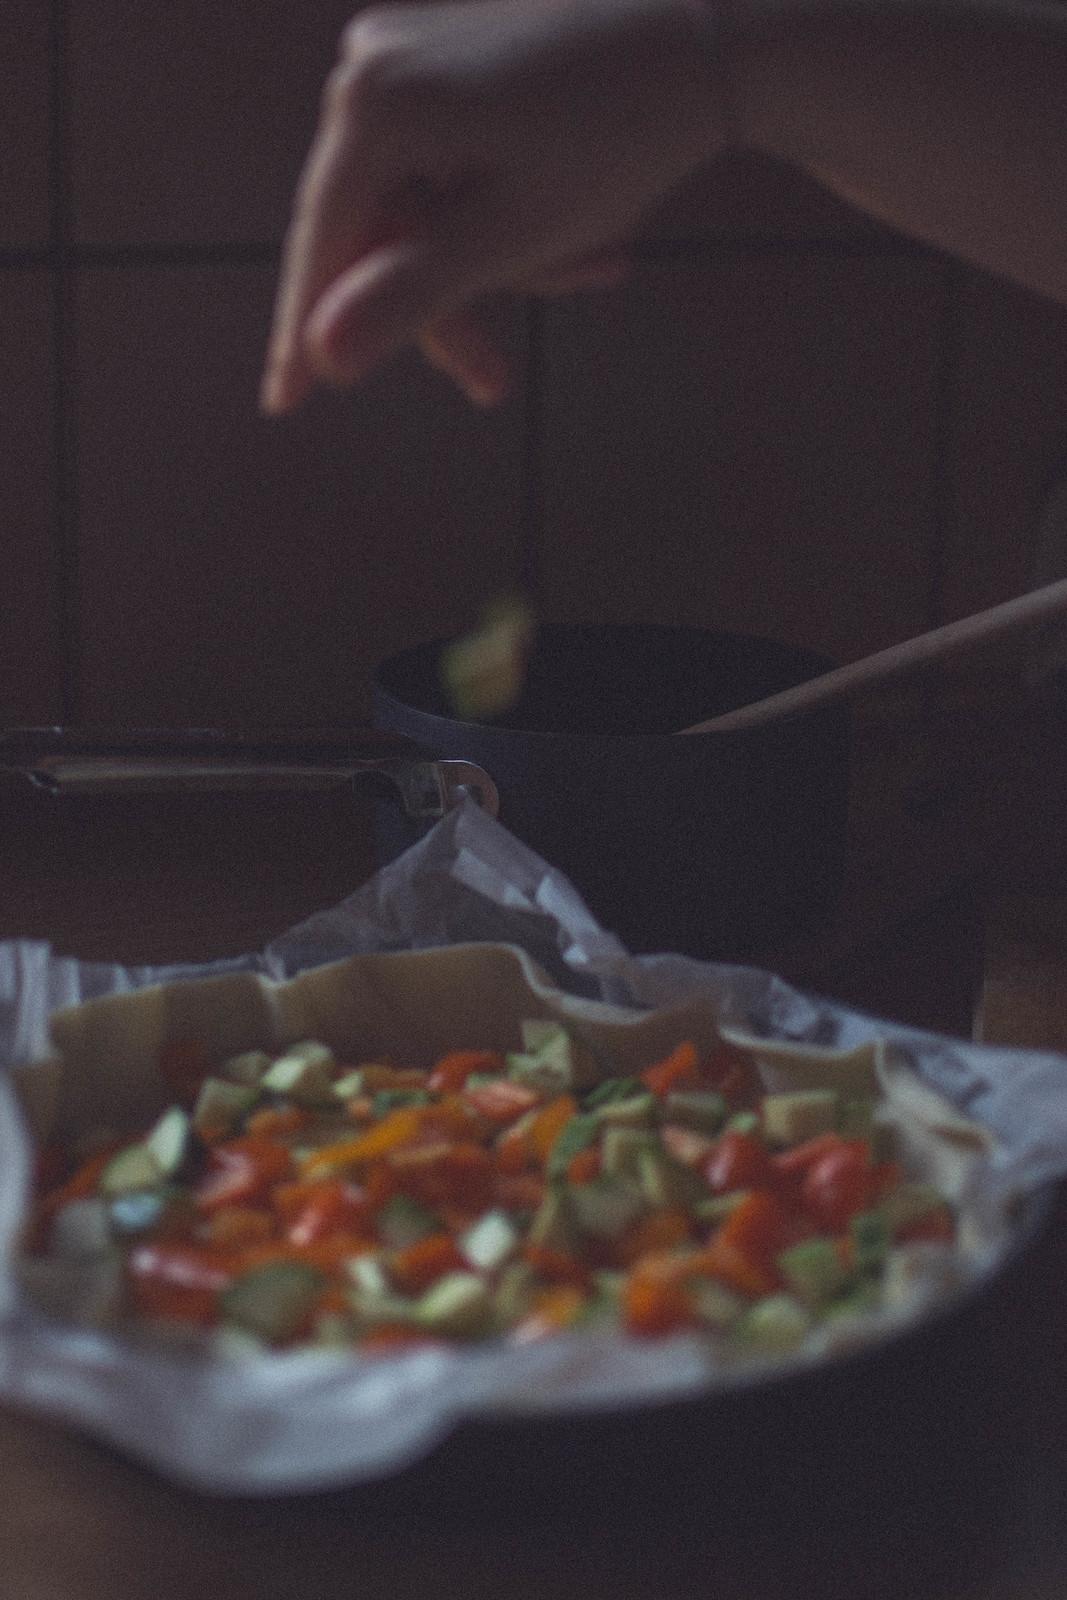 Cheese + Vegetables Tart Recipe